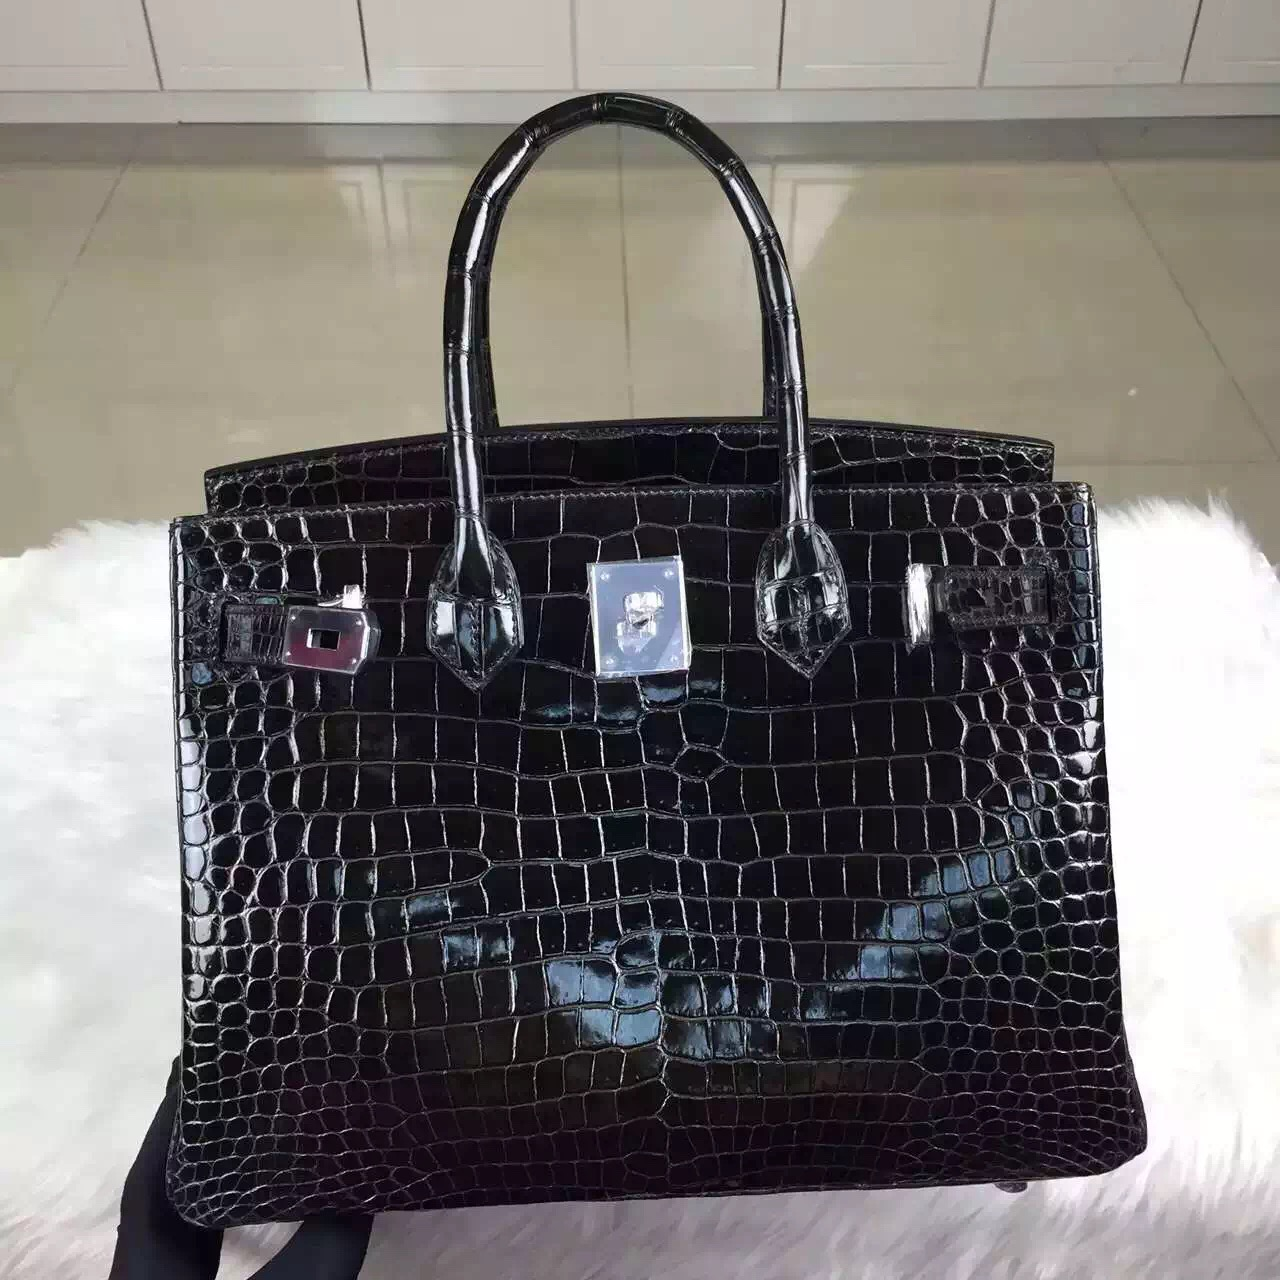 Cheap Hermes Birkin30 CK88 Graphite Grey Crocodile Shiny Leather